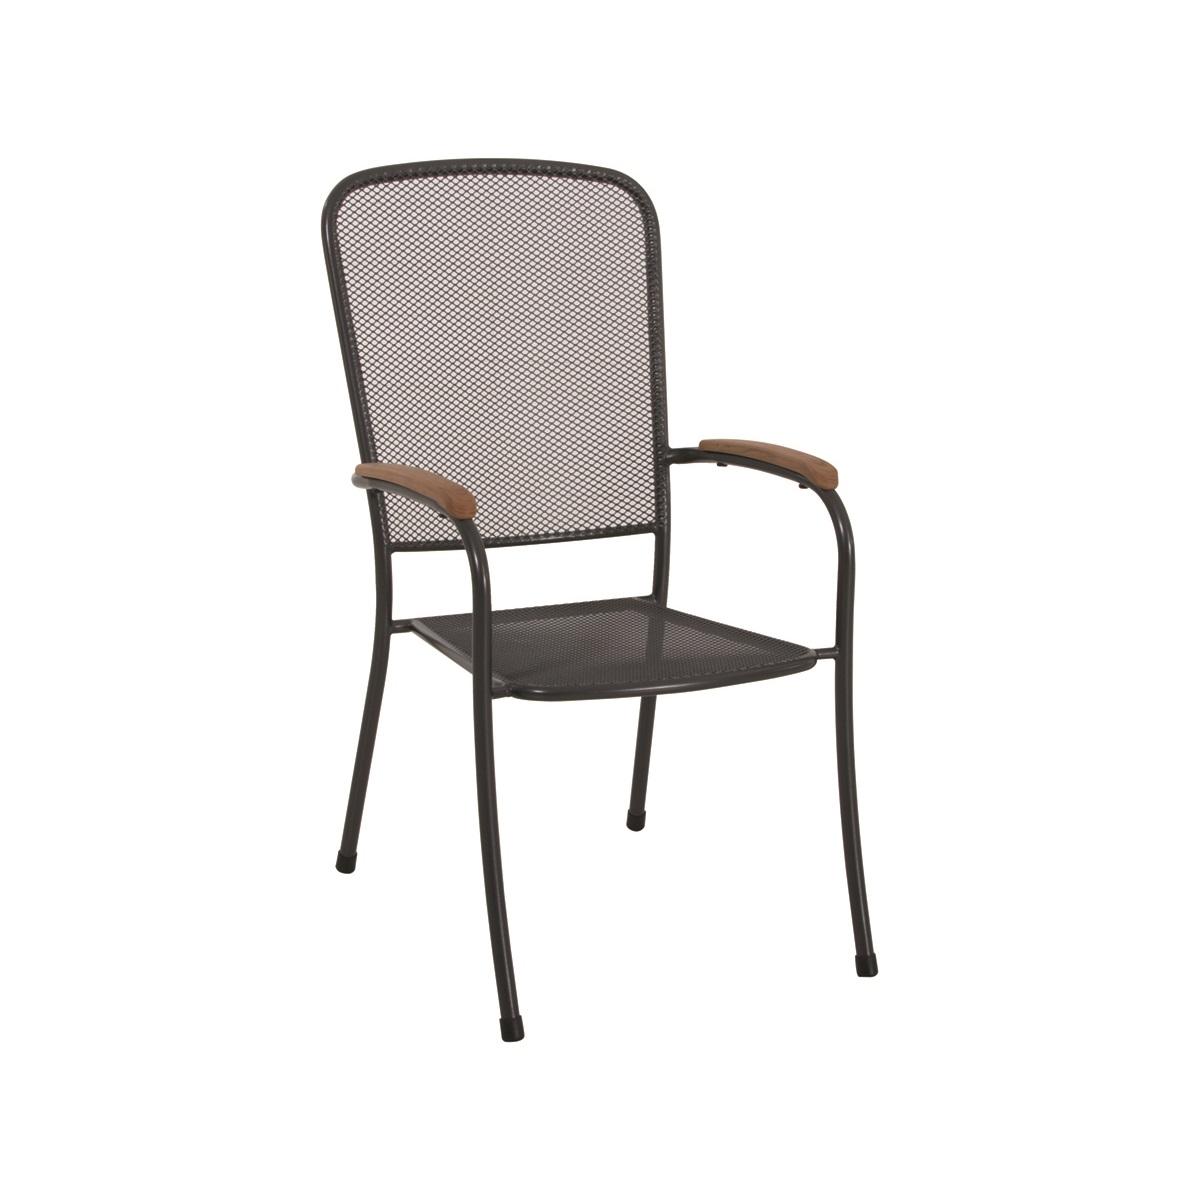 MWH Mesona, stohovatelná židle z tahokovu 66,5 x 54,5 x 98,5 cm